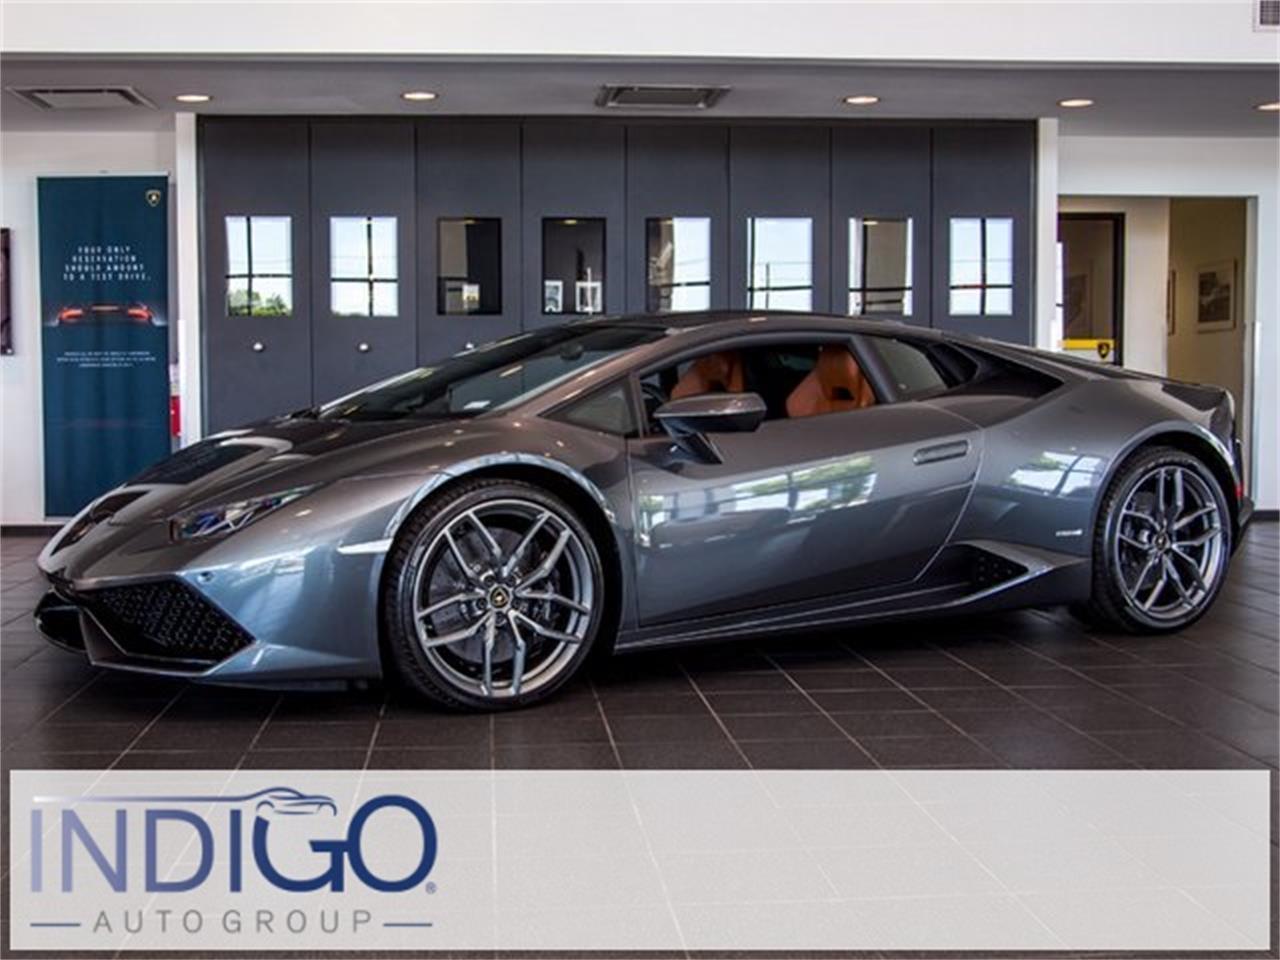 2015 Lamborghini Lp610 4 For Sale Classiccars Com Cc 1057115